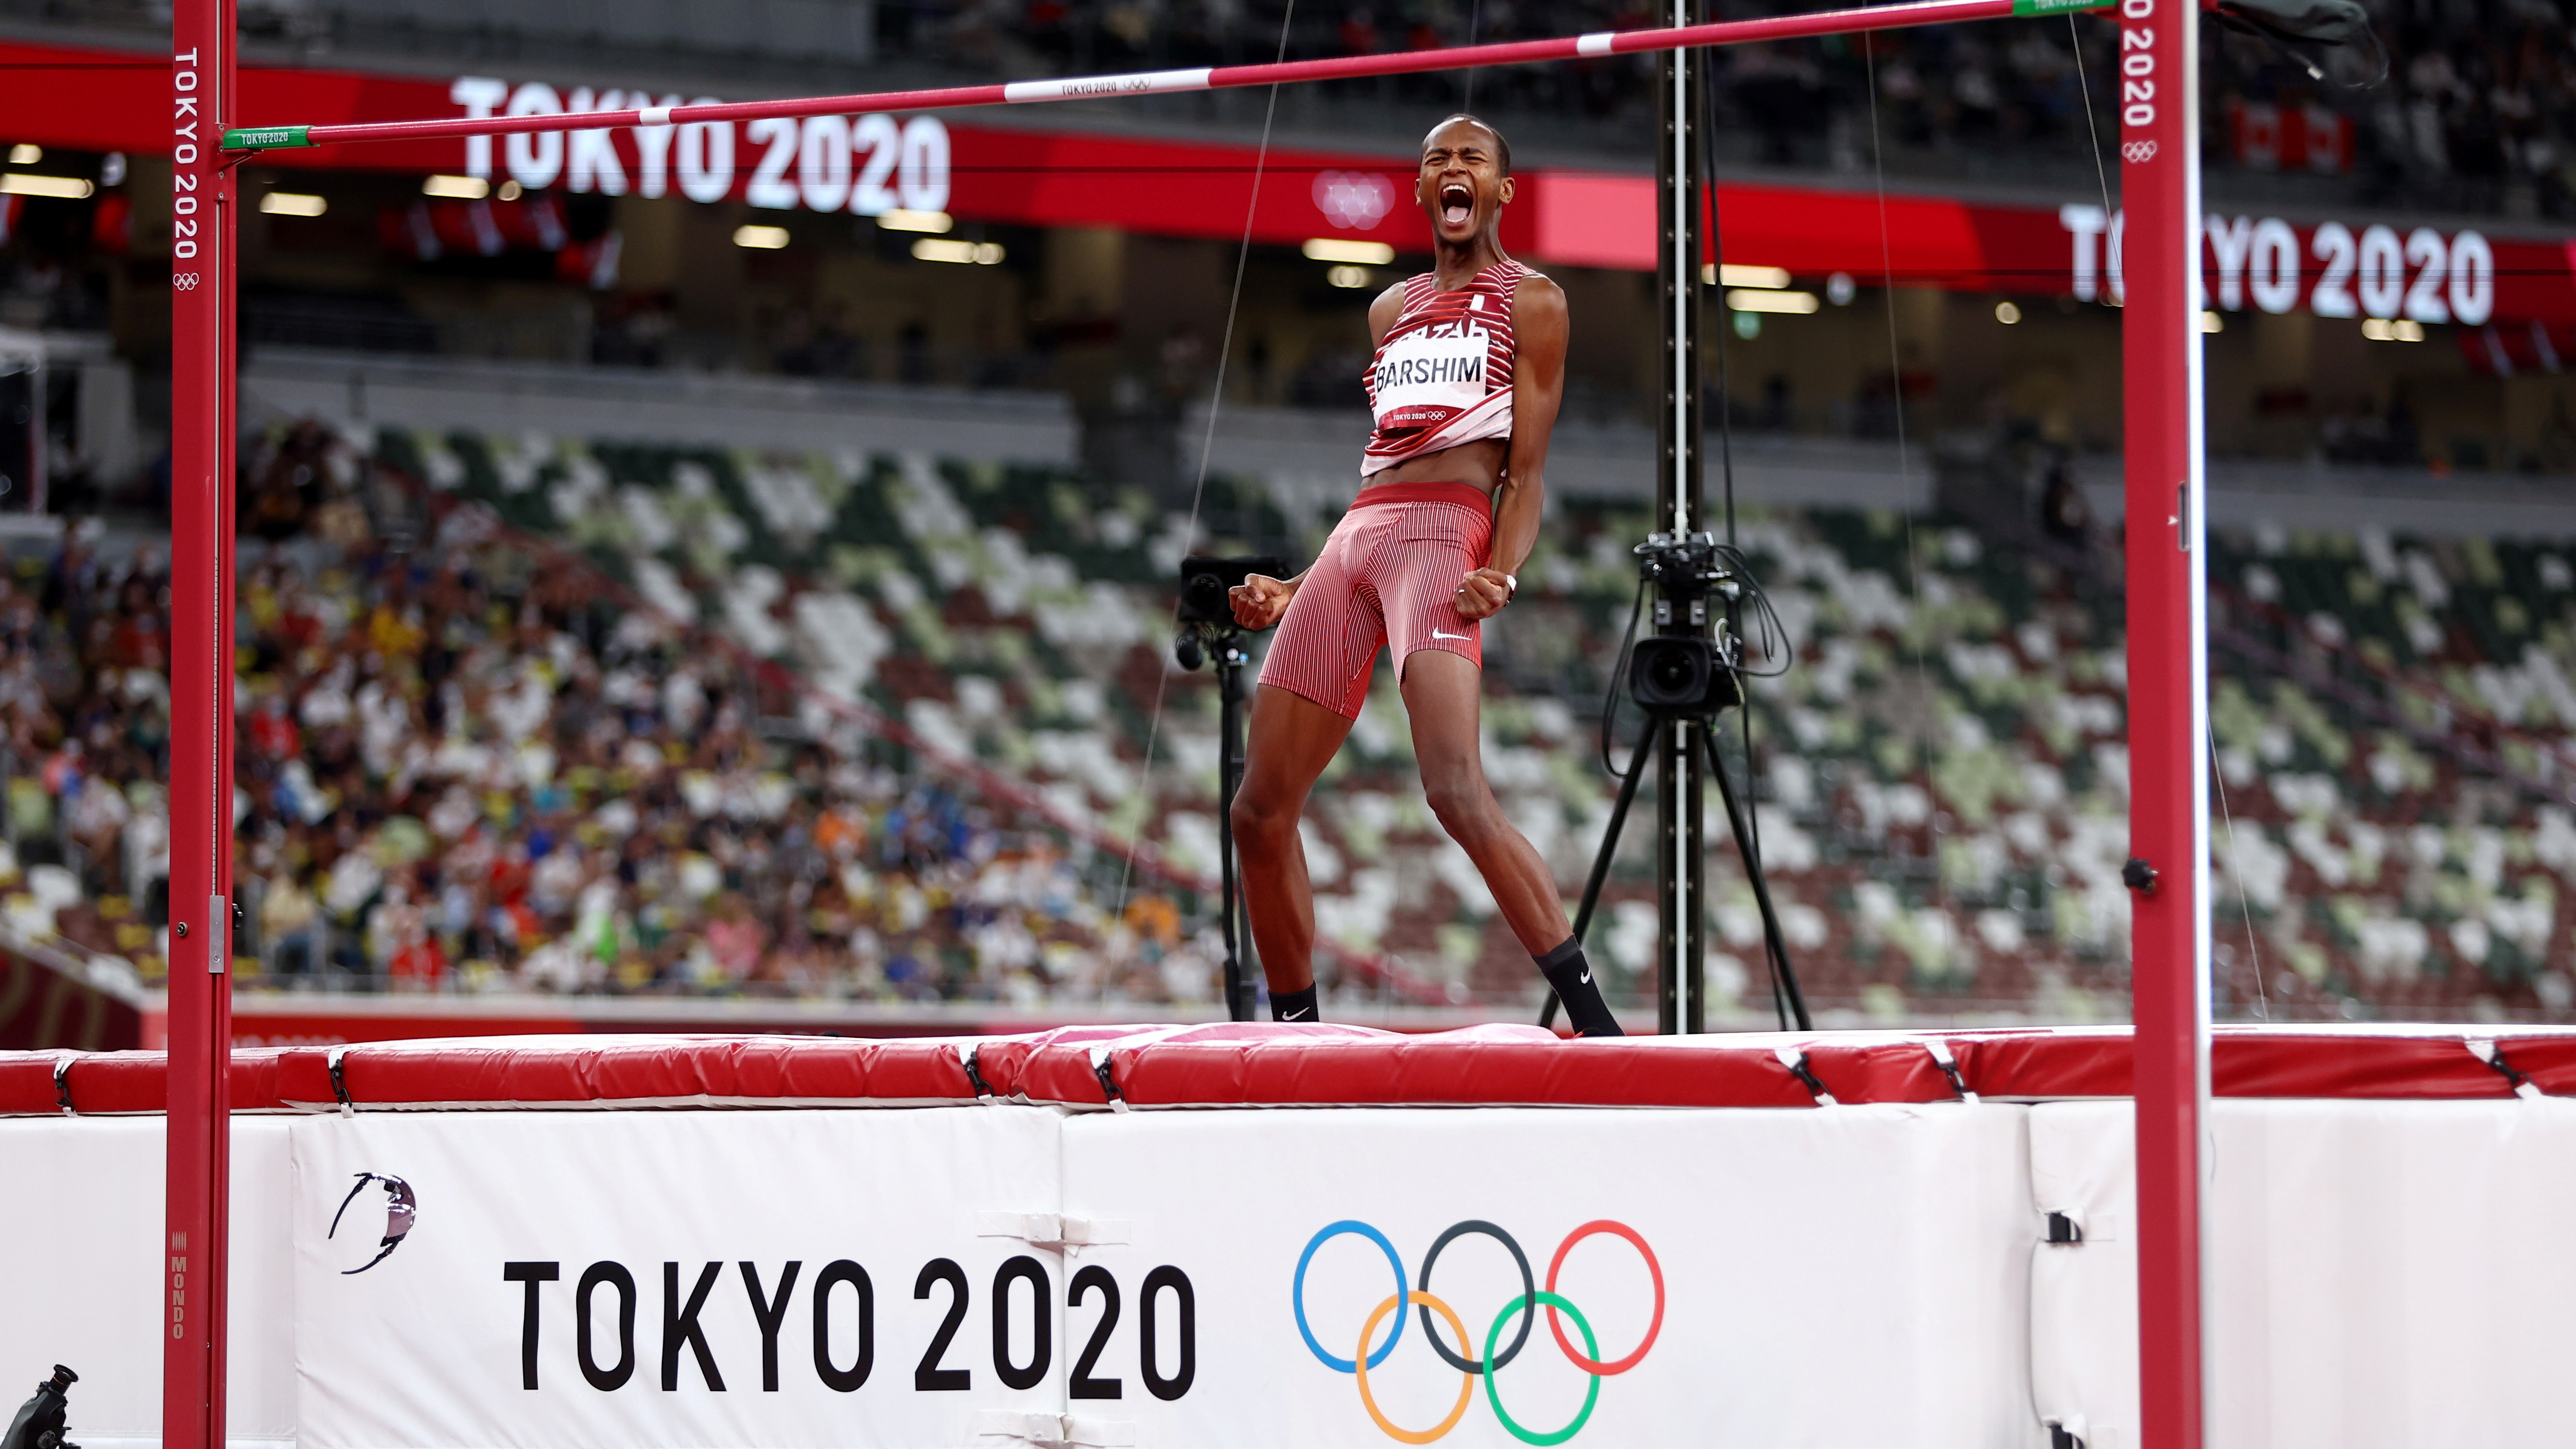 Tokyo 2020 Olympics - Athletics - Men's High Jump - Final- OLS - Olympic Stadium, Tokyo, Japan – August 1, 2021. Mutaz Essa Barshim of Qatar celebrates after his jump REUTERS/Kai Pfaffenbach